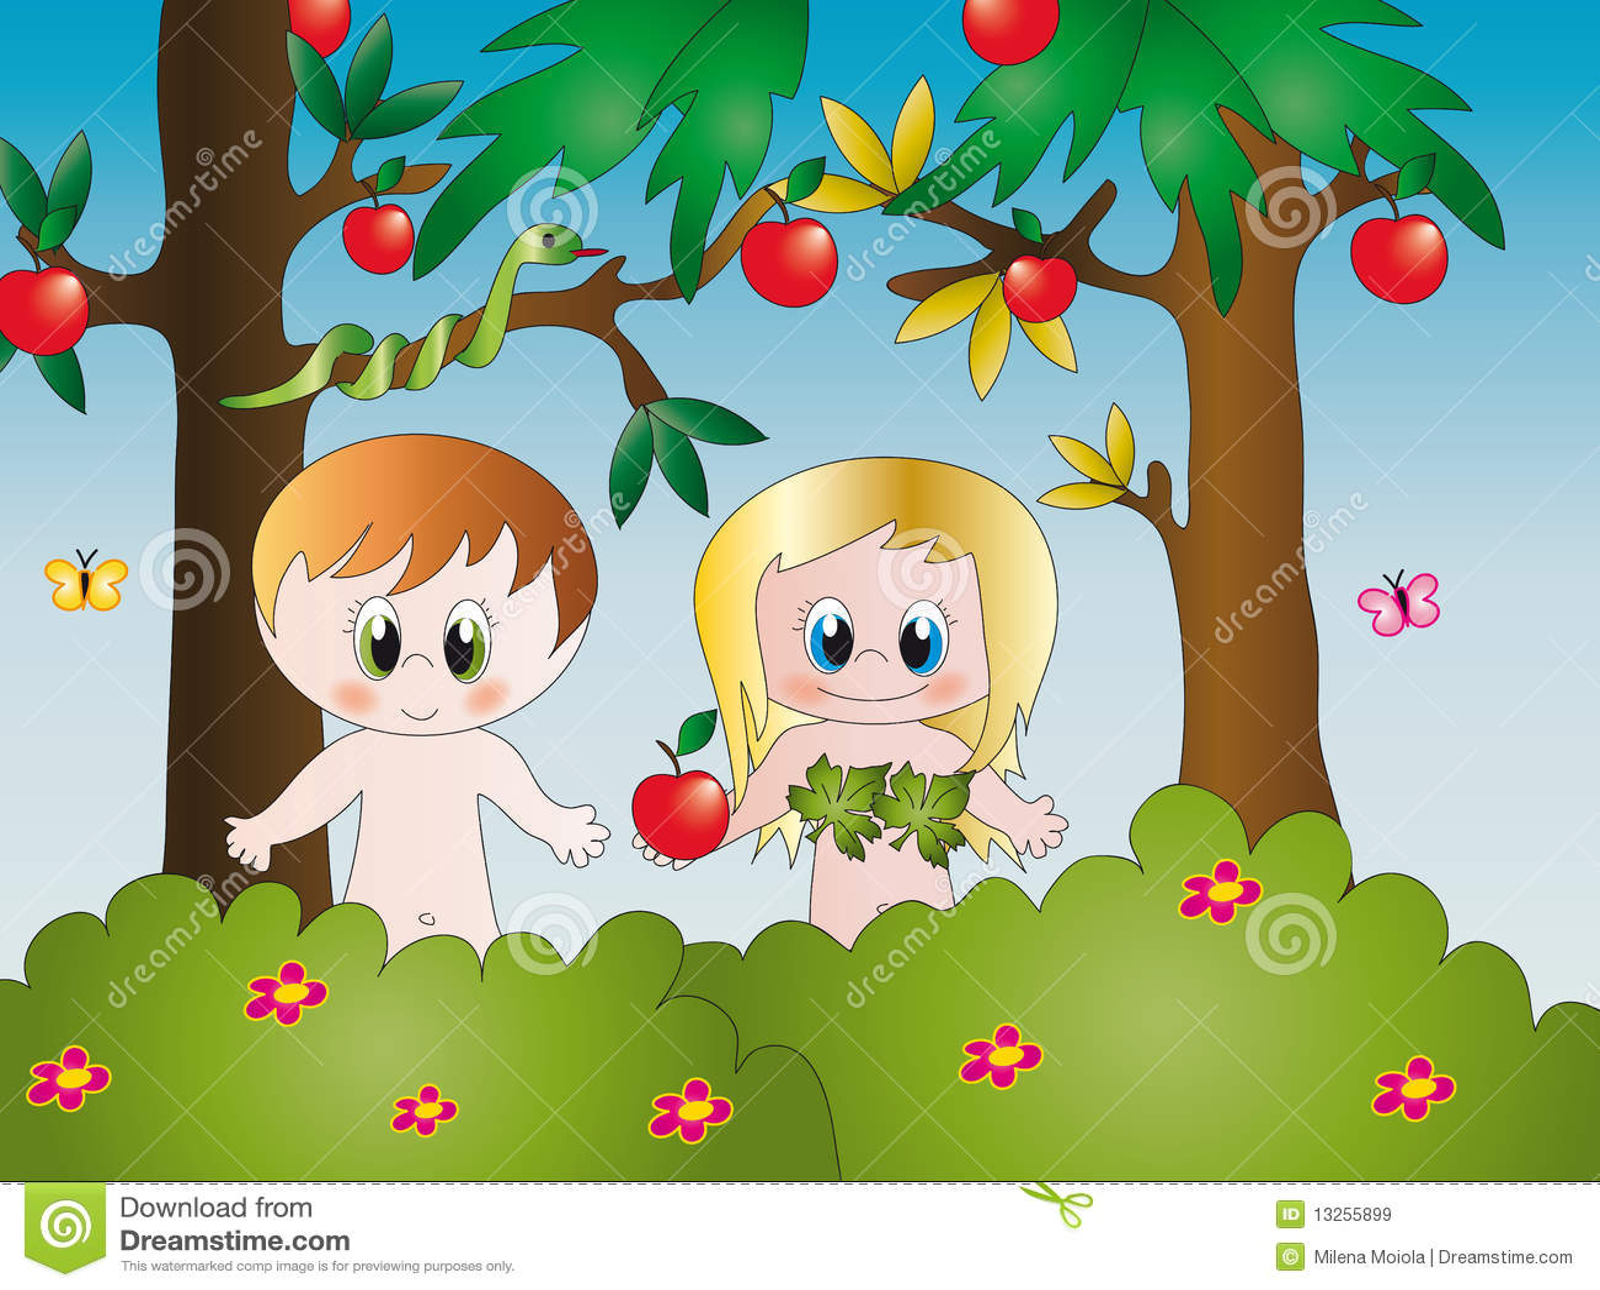 Ilustraci  N De Ad  N Y De Eva En El Jard  N De Eden